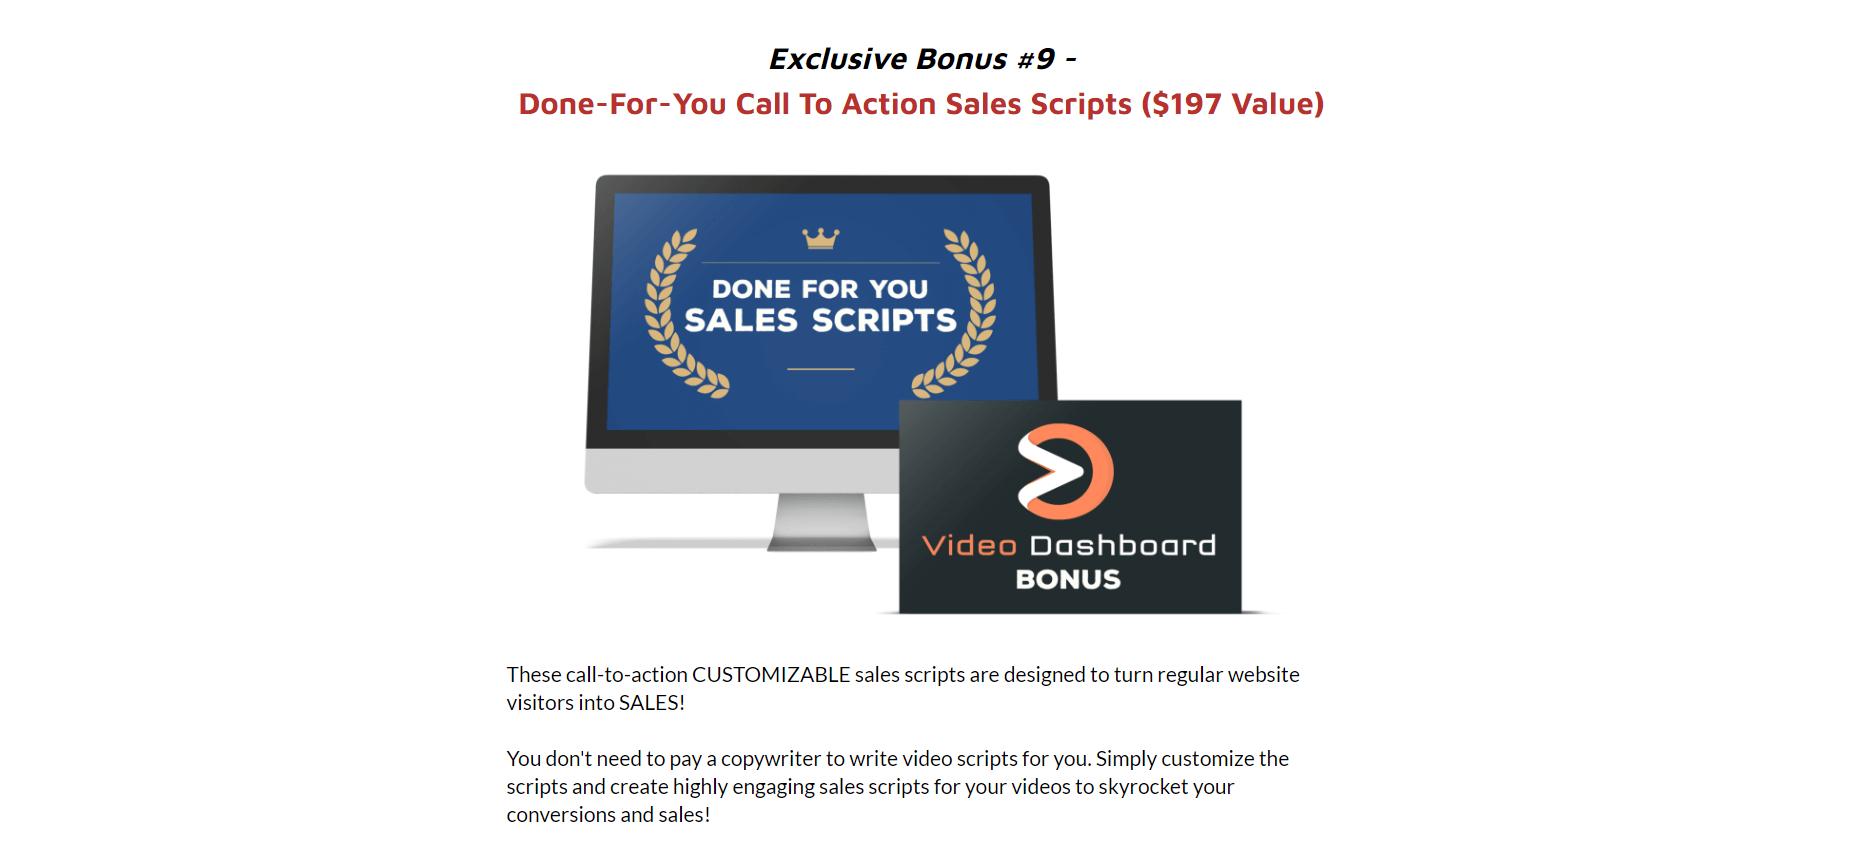 Video-Dashboard-Bonus-9